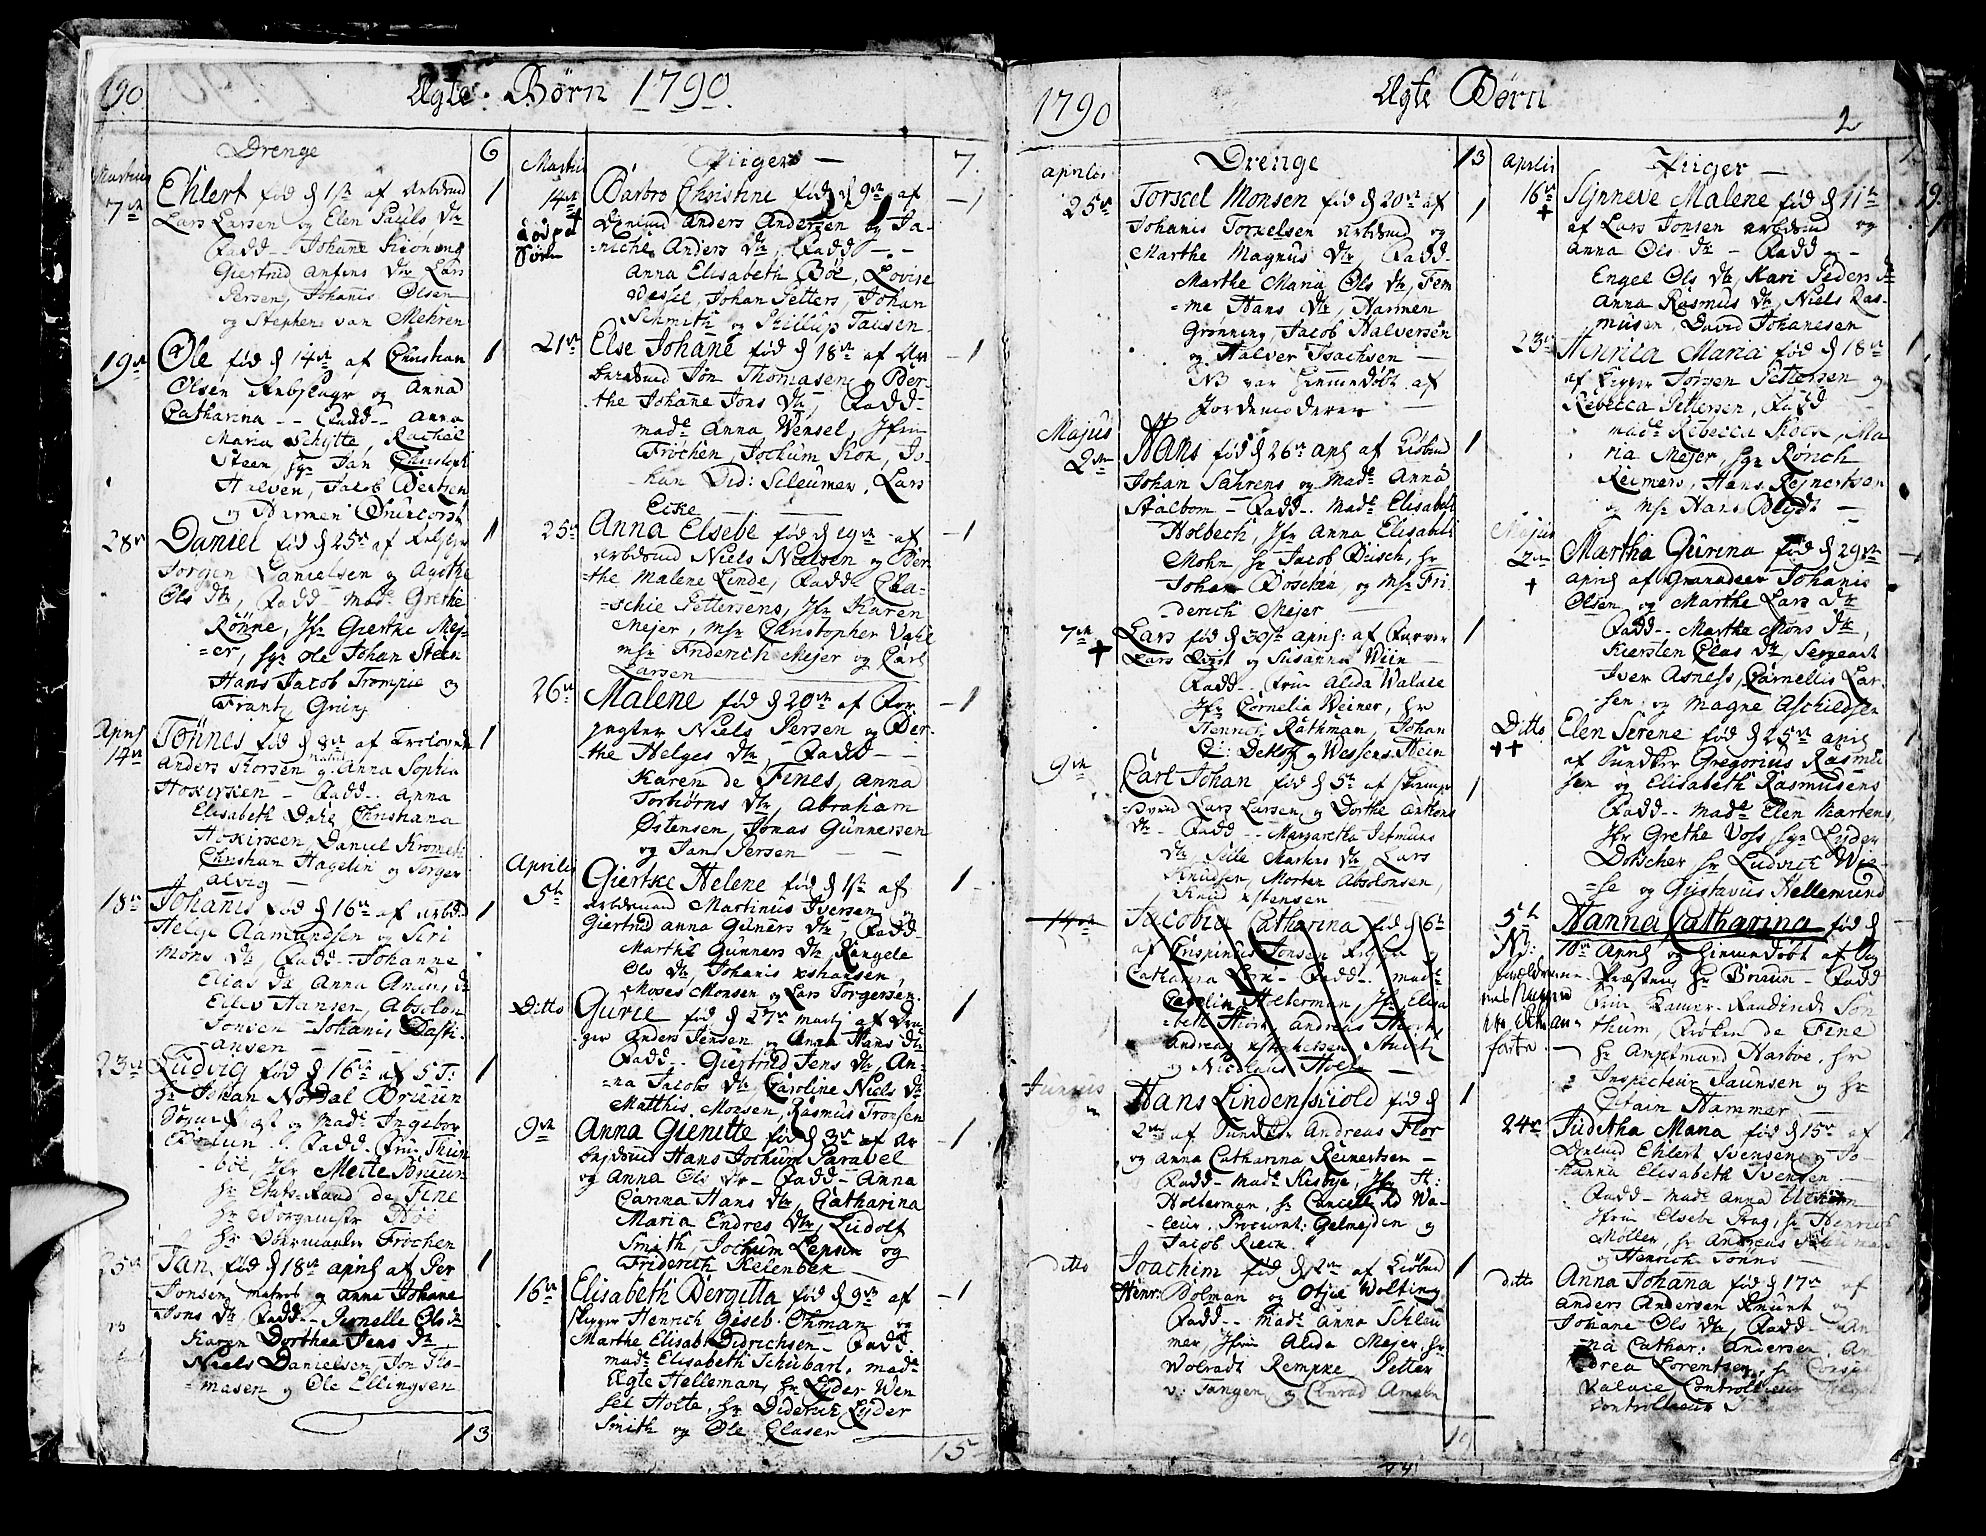 SAB, Korskirken Sokneprestembete, H/Haa/L0006: Ministerialbok nr. A 6, 1790-1820, s. 2